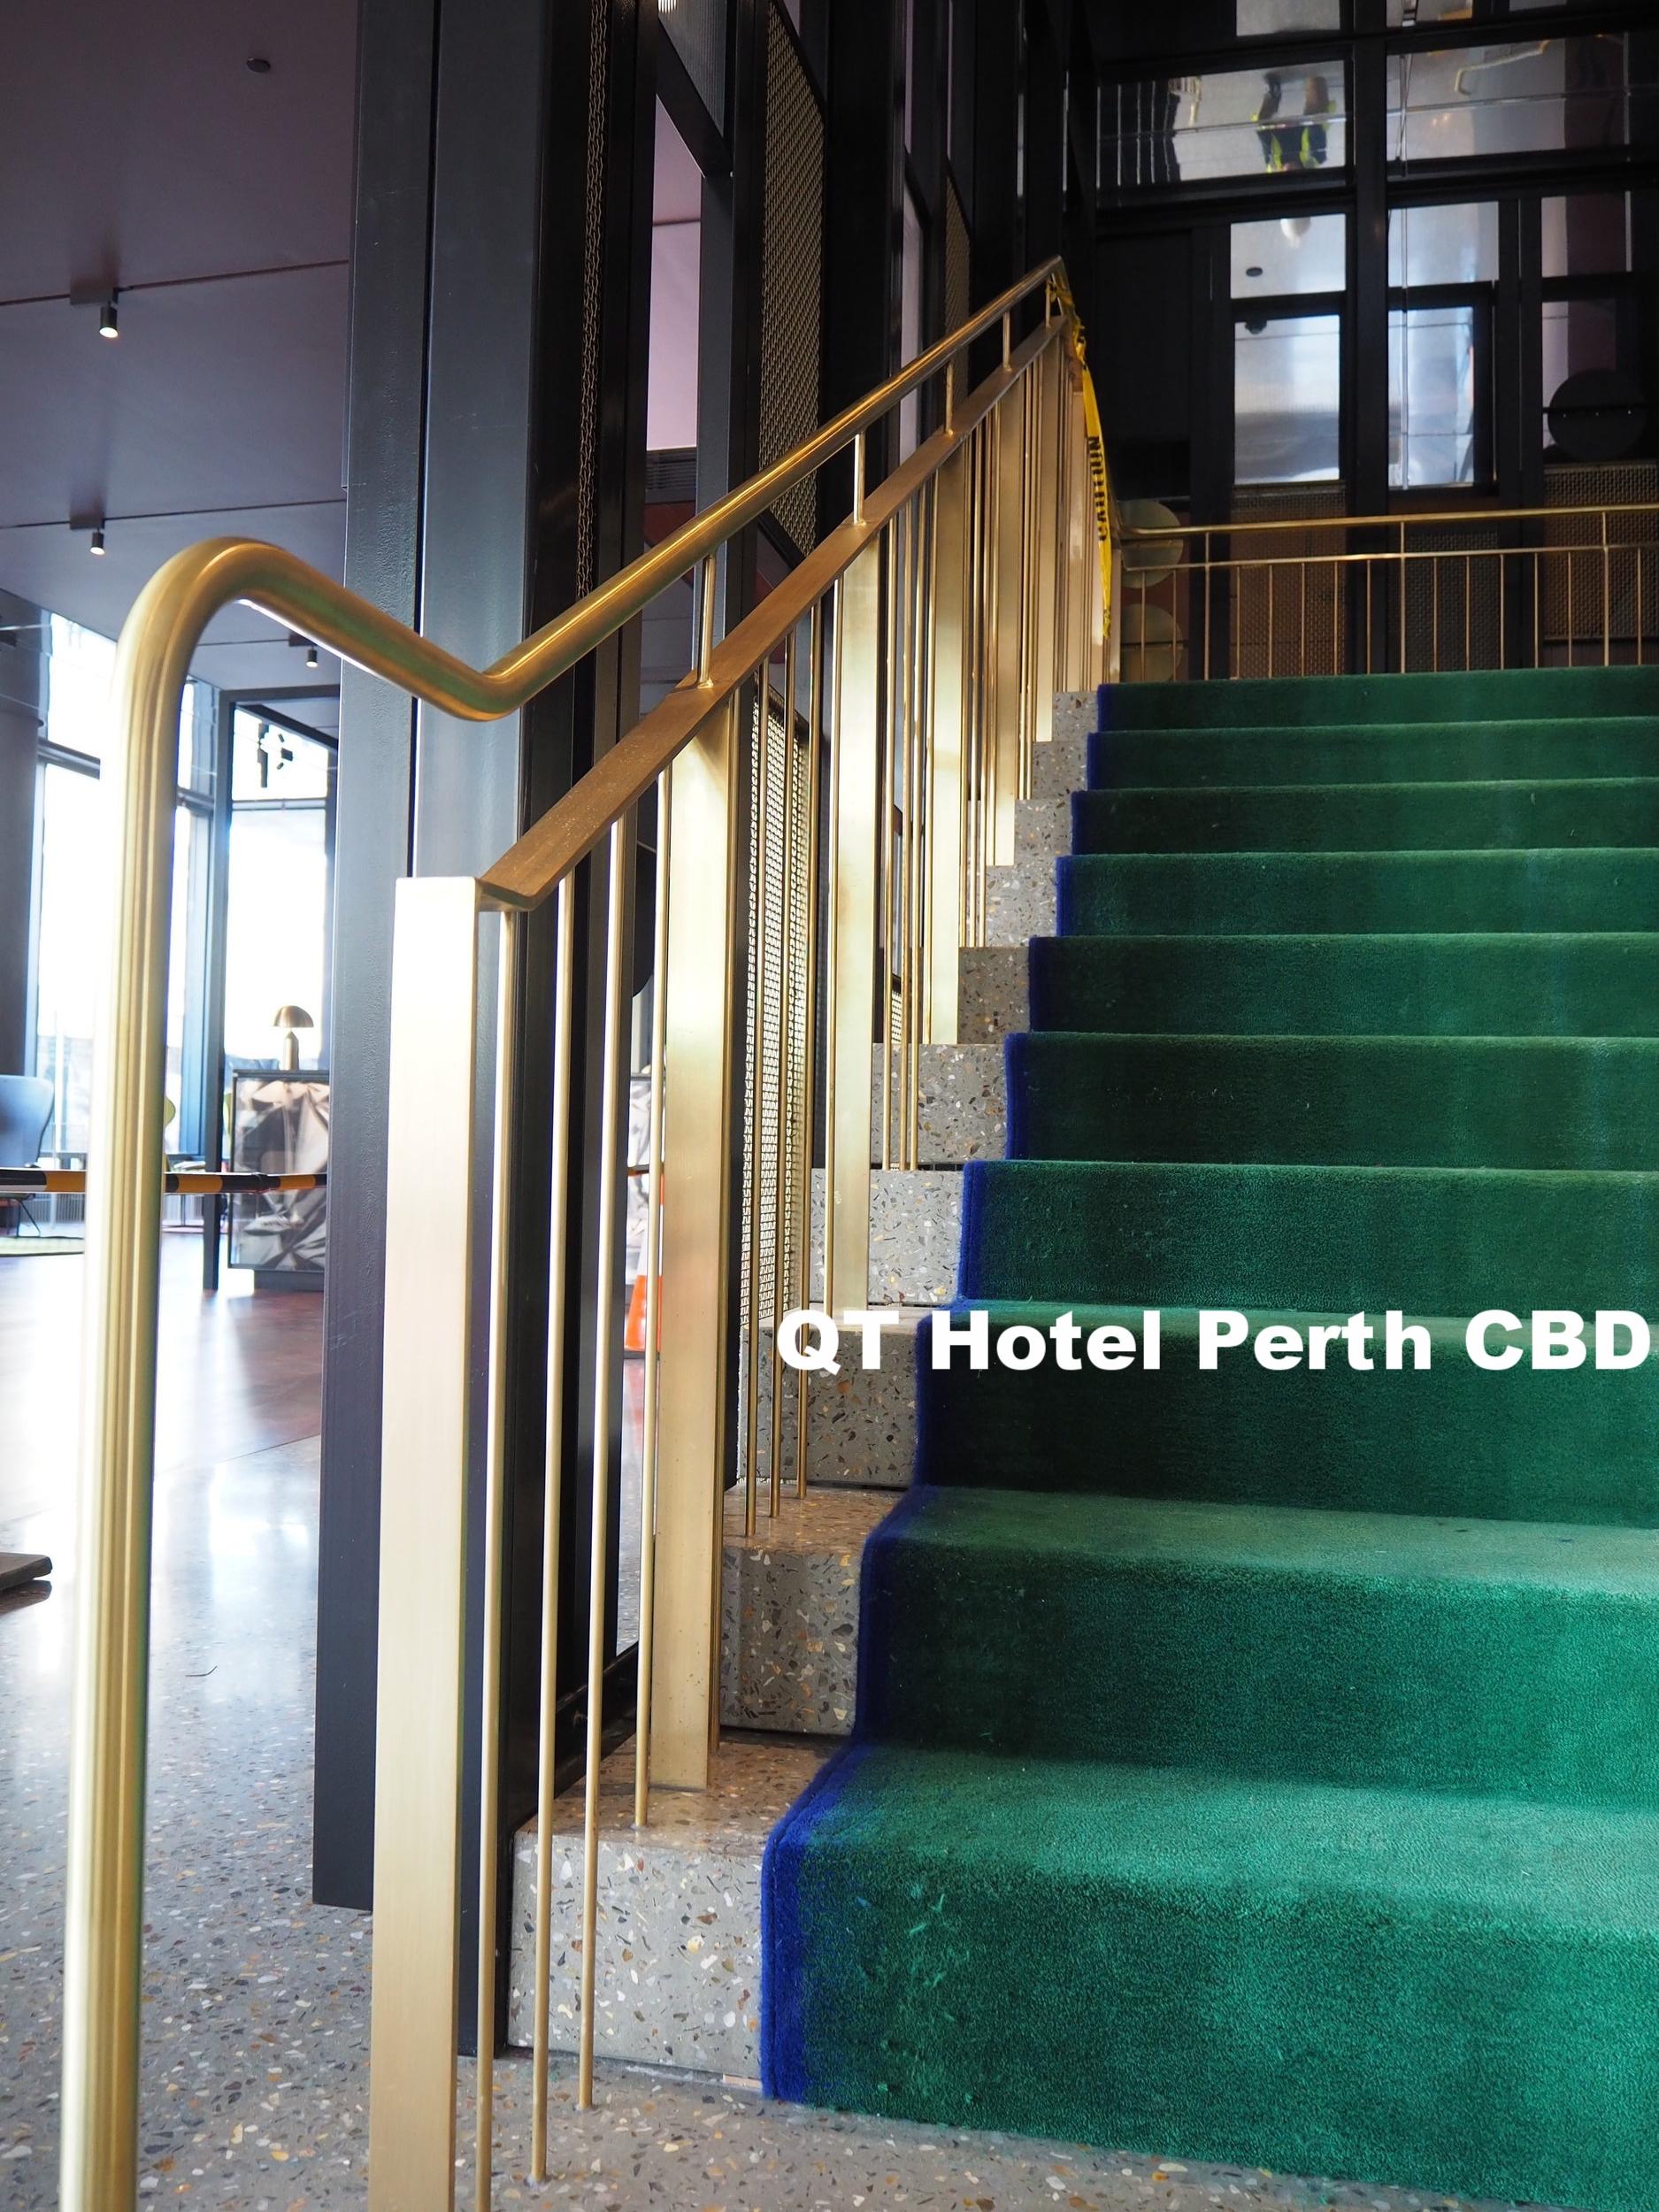 QT Hotel Perth brass balustrade and handrail 2.JPG